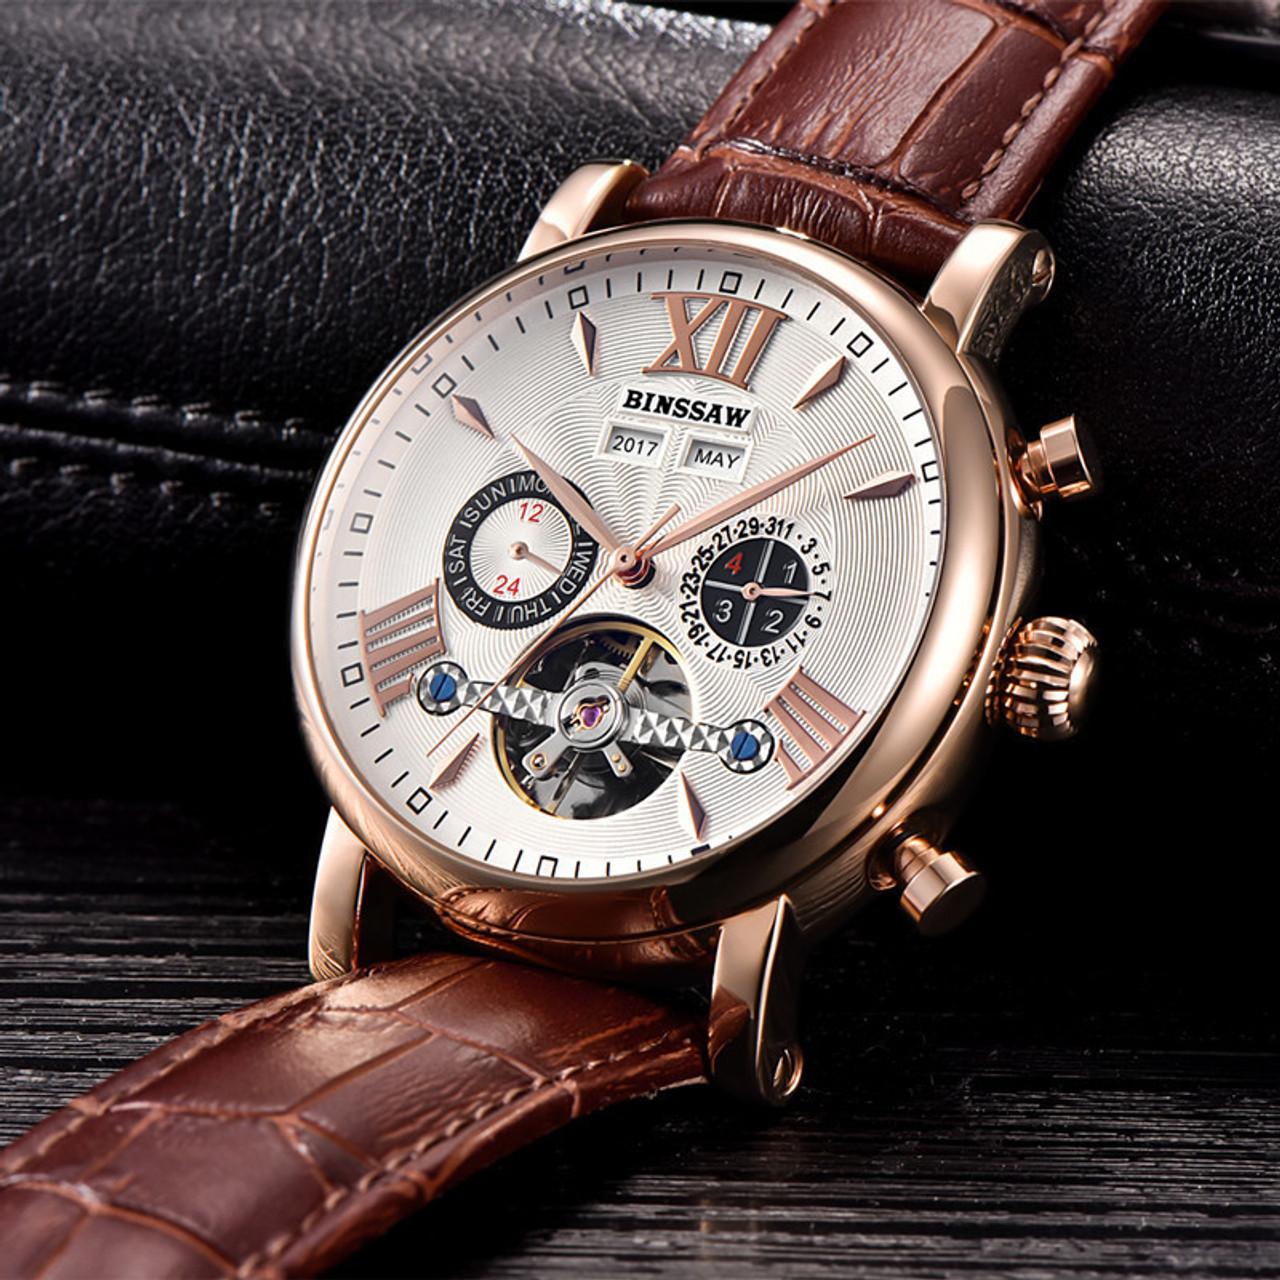 acdb7c485 ... BINSSAW Men Tourbillon Automatic Mechanical Watch Luxury Fashion Casual  Brand Leather Man Week Gold Watches relogio ...